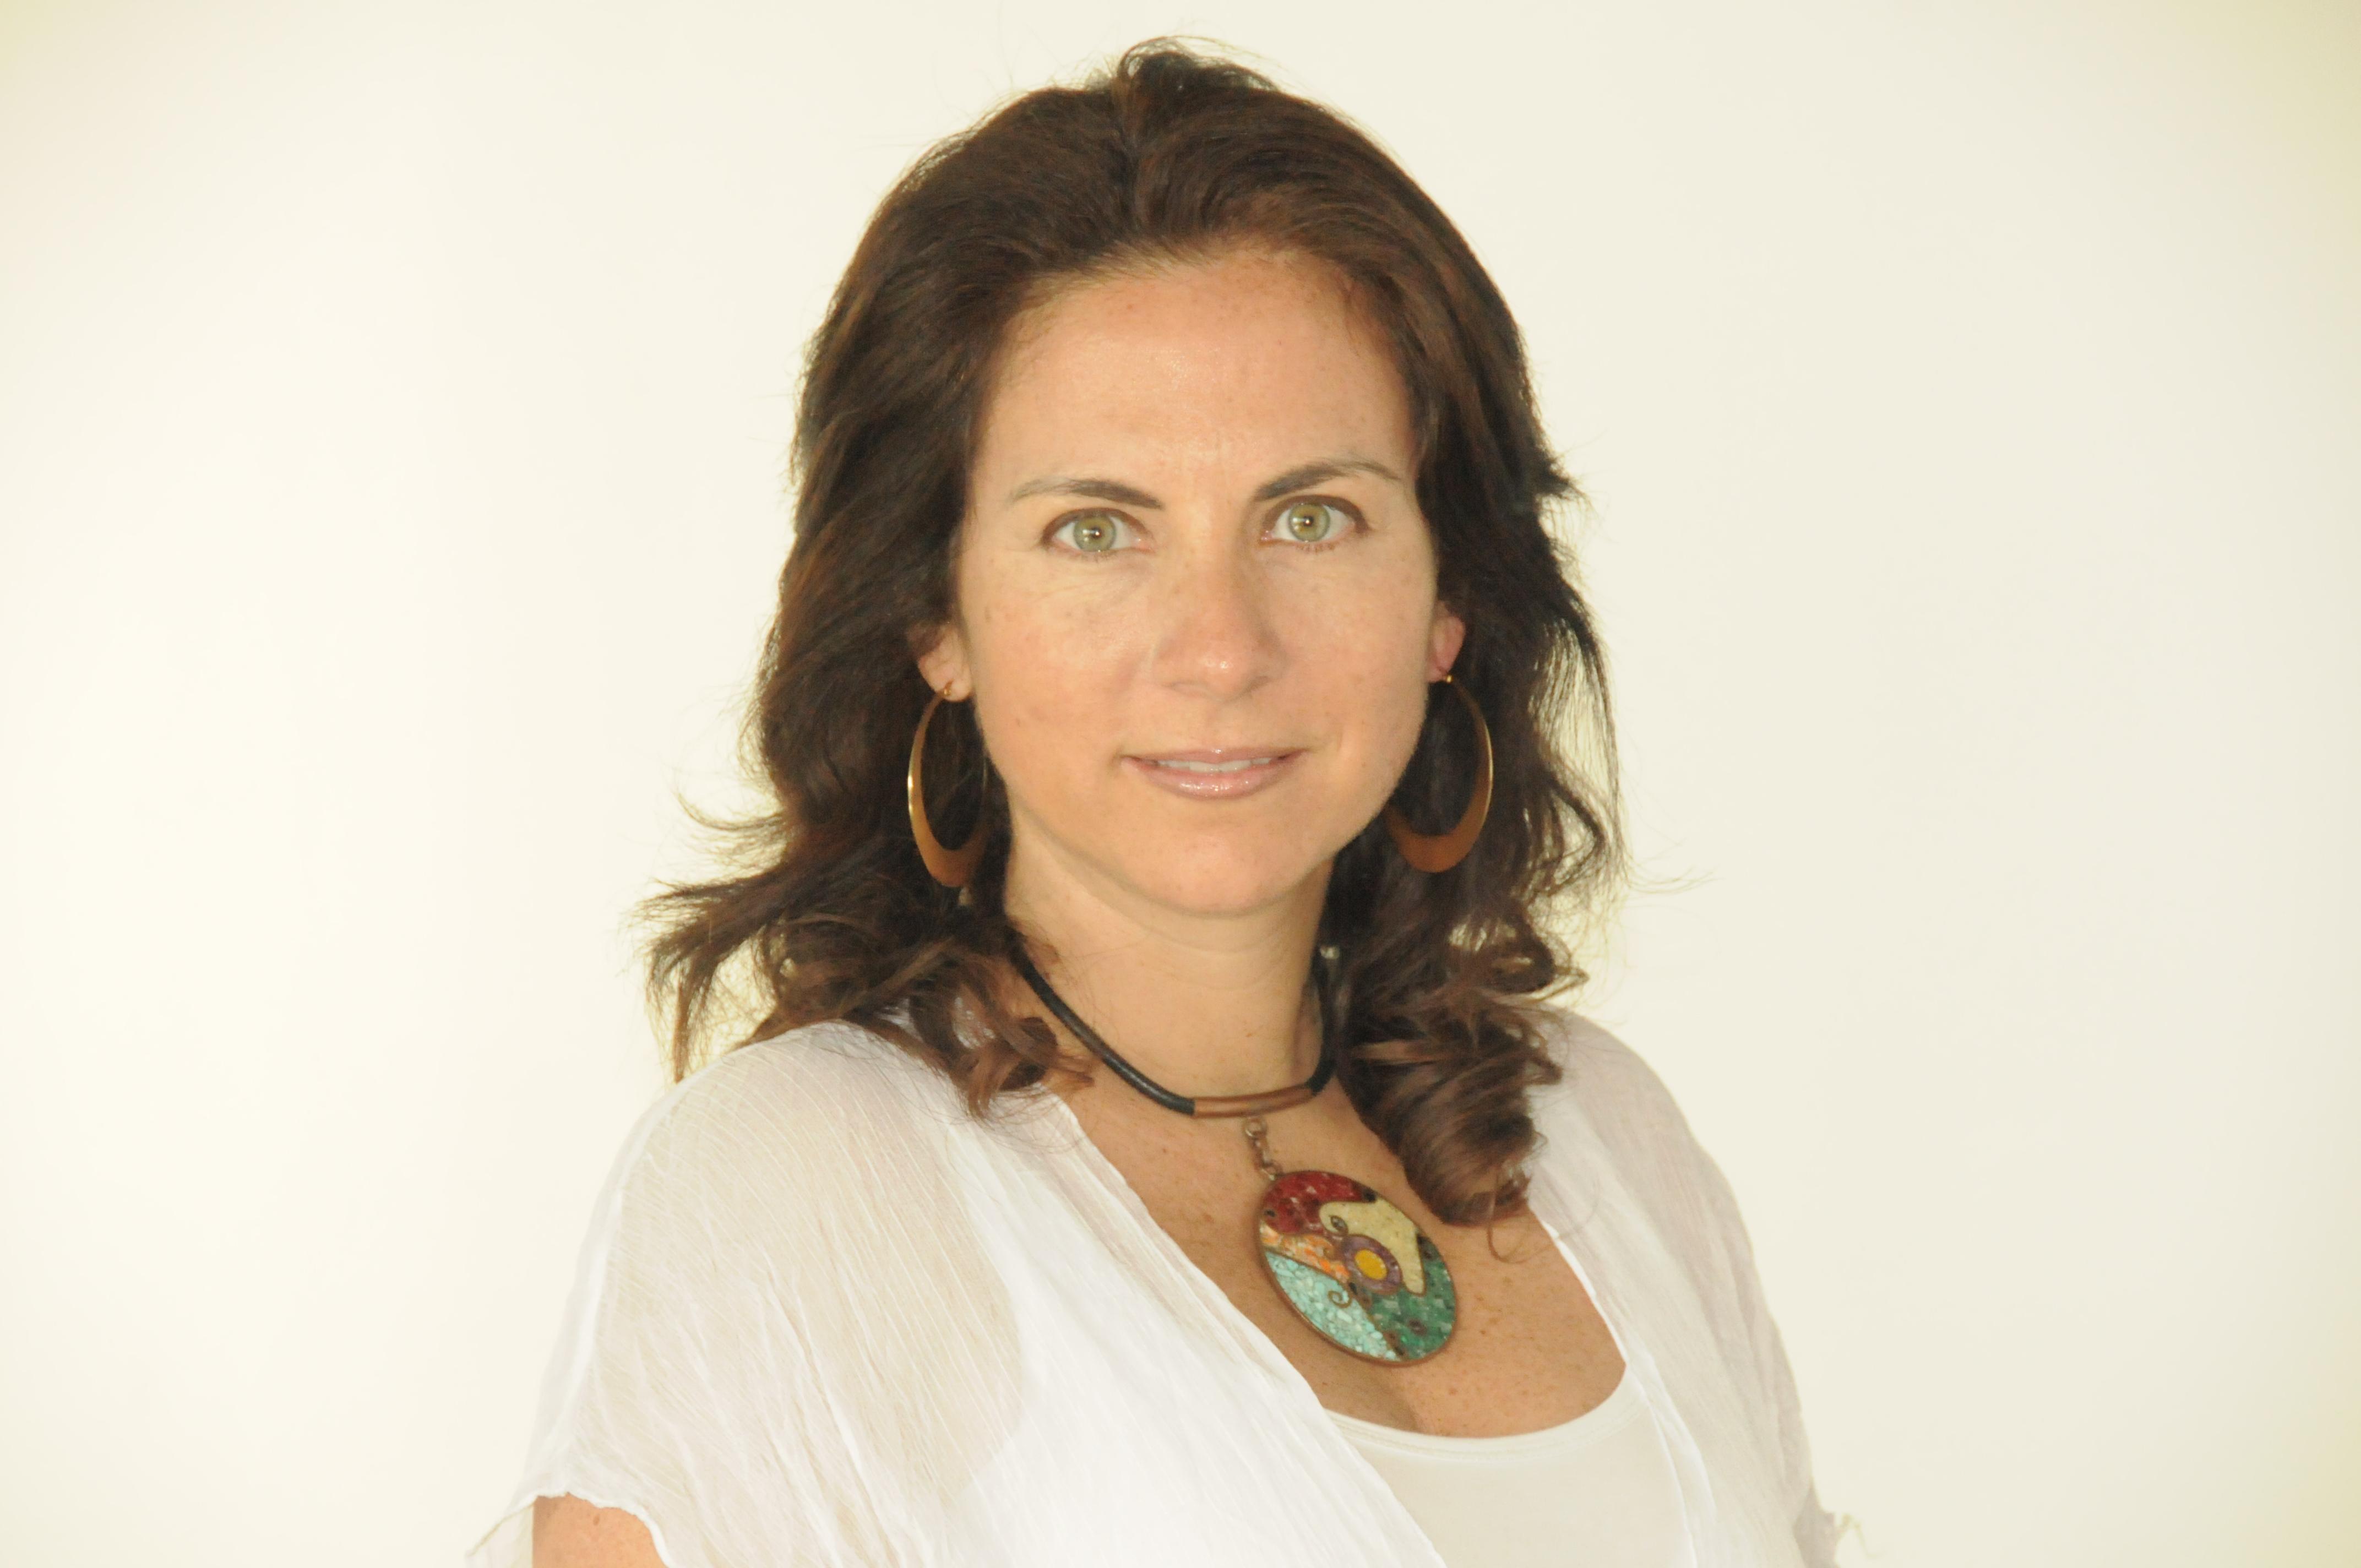 Mónica Retamal